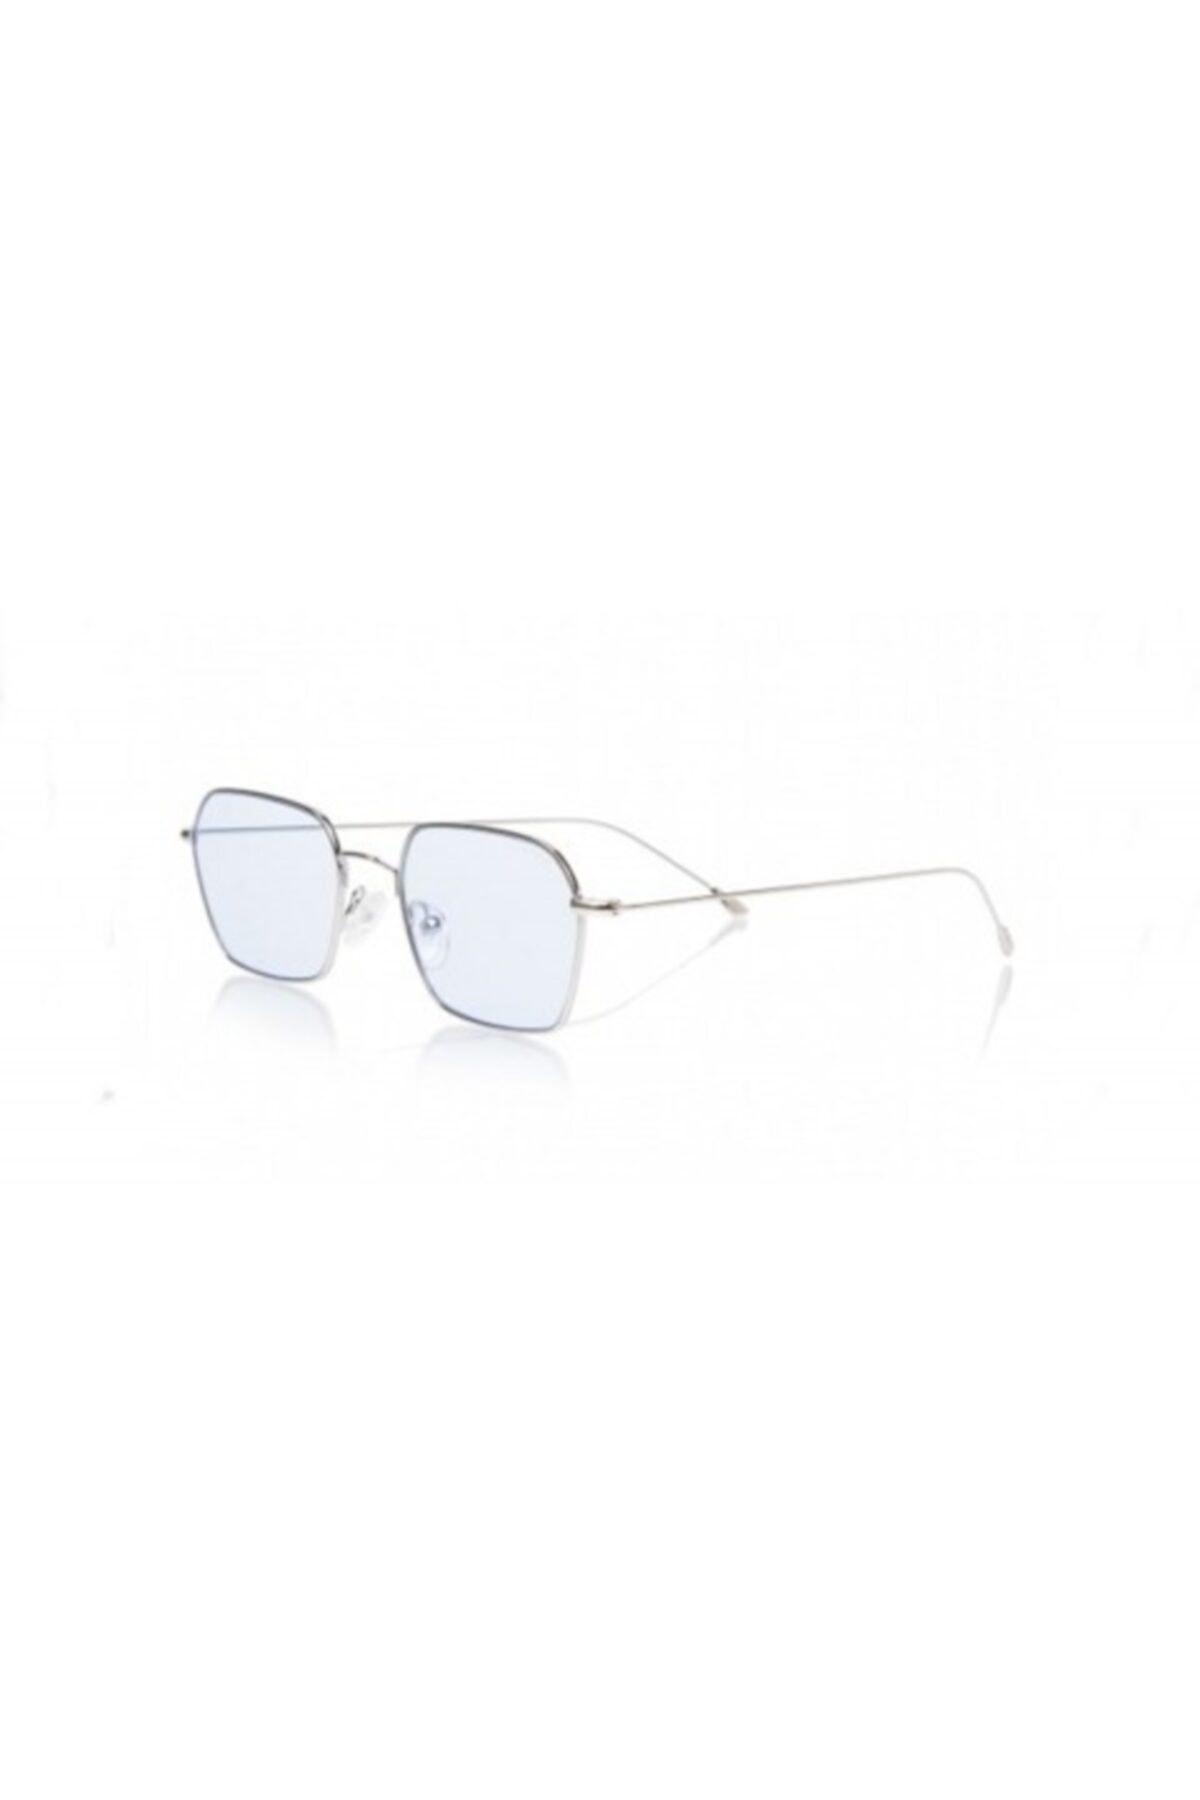 خرید عینک آفتابی خفن برند Osse رنگ آبی کد ty42579125